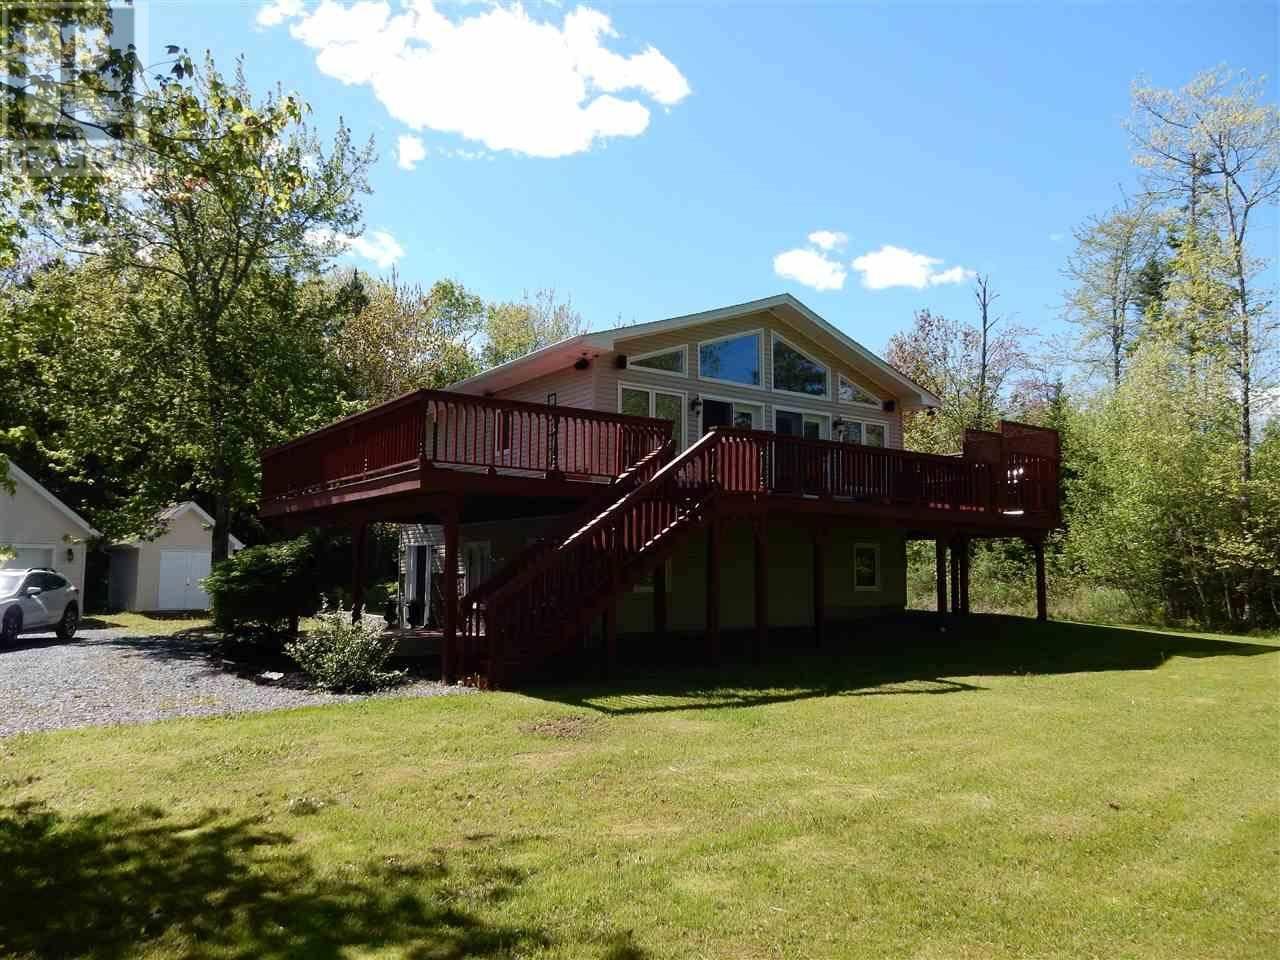 House for sale at 24 Ash Ln Enfield Nova Scotia - MLS: 201913329